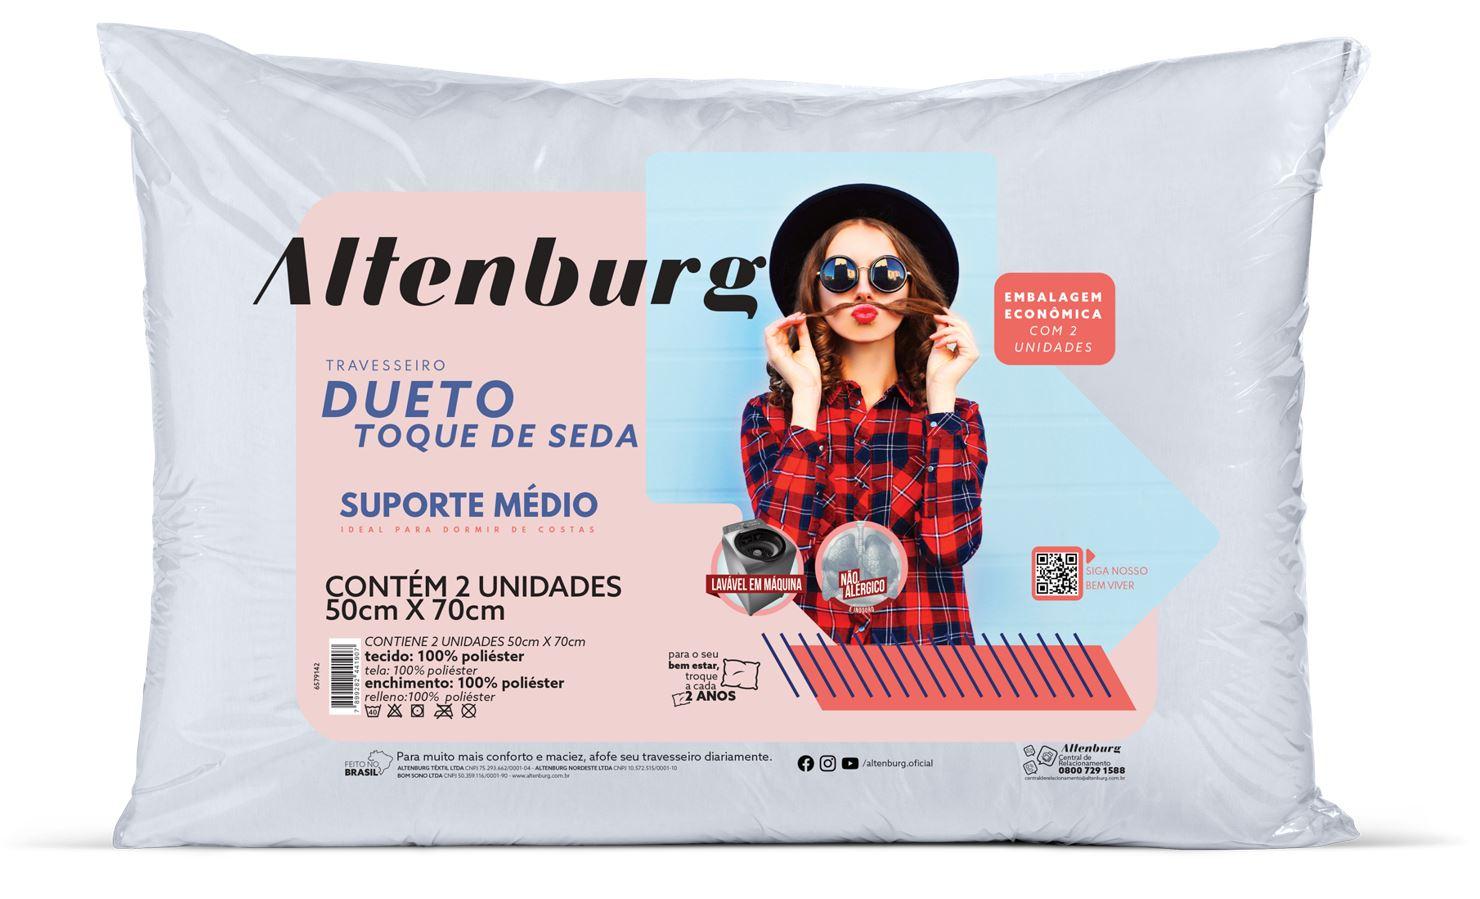 Kit 2 Travesseiros Dueto Toque de Seda 50 x 70 Altenburg